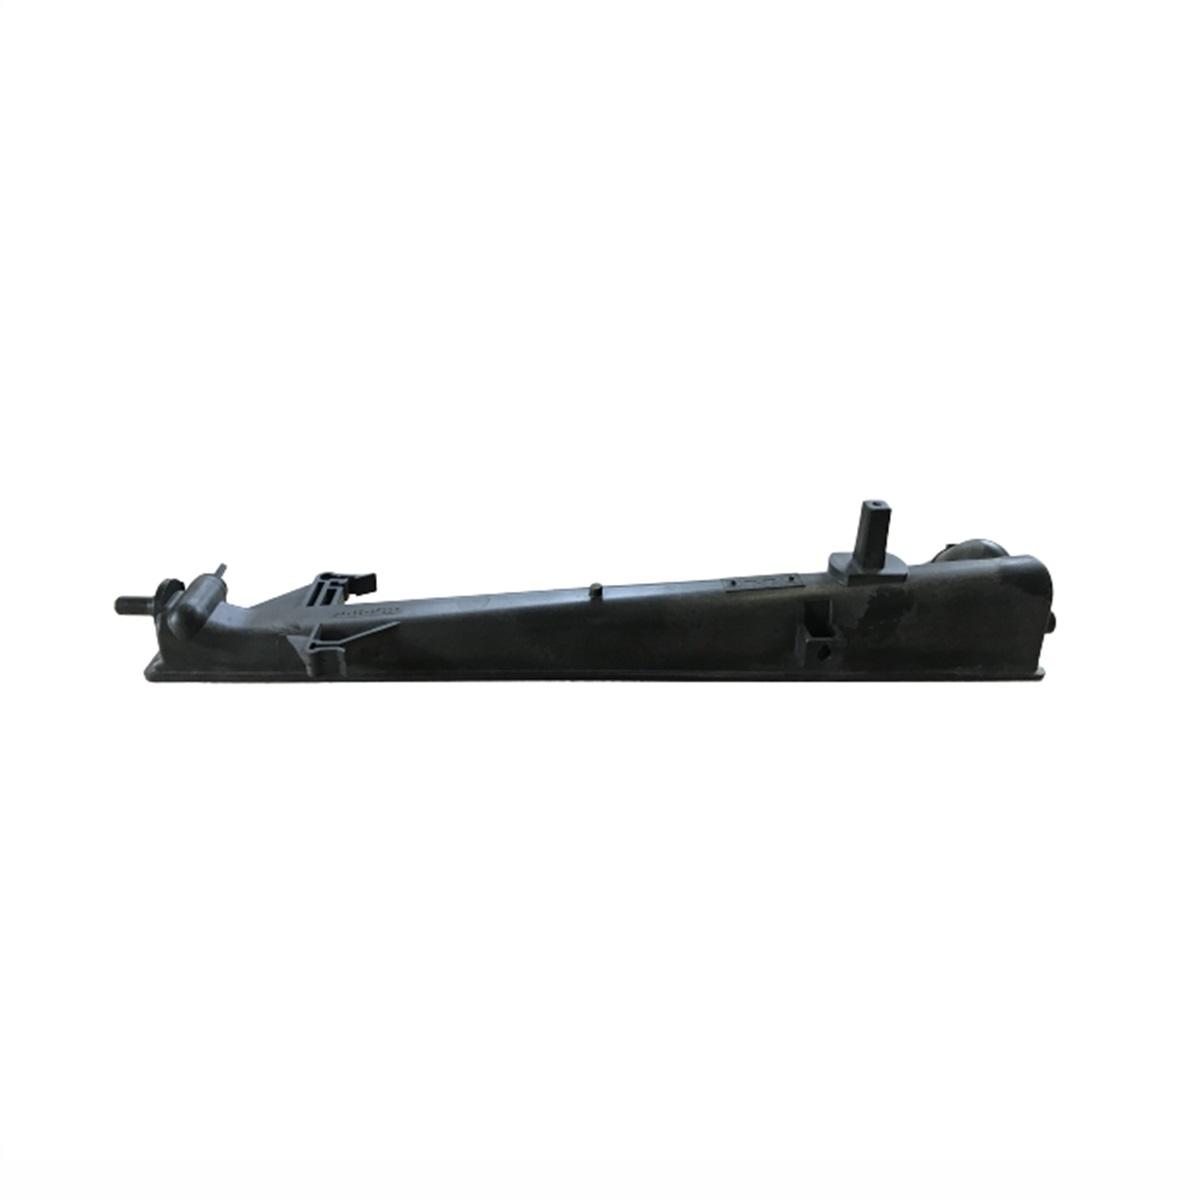 Caixa de Radiador Inferior Hyundai Tucson Lisa 46mmx473mm